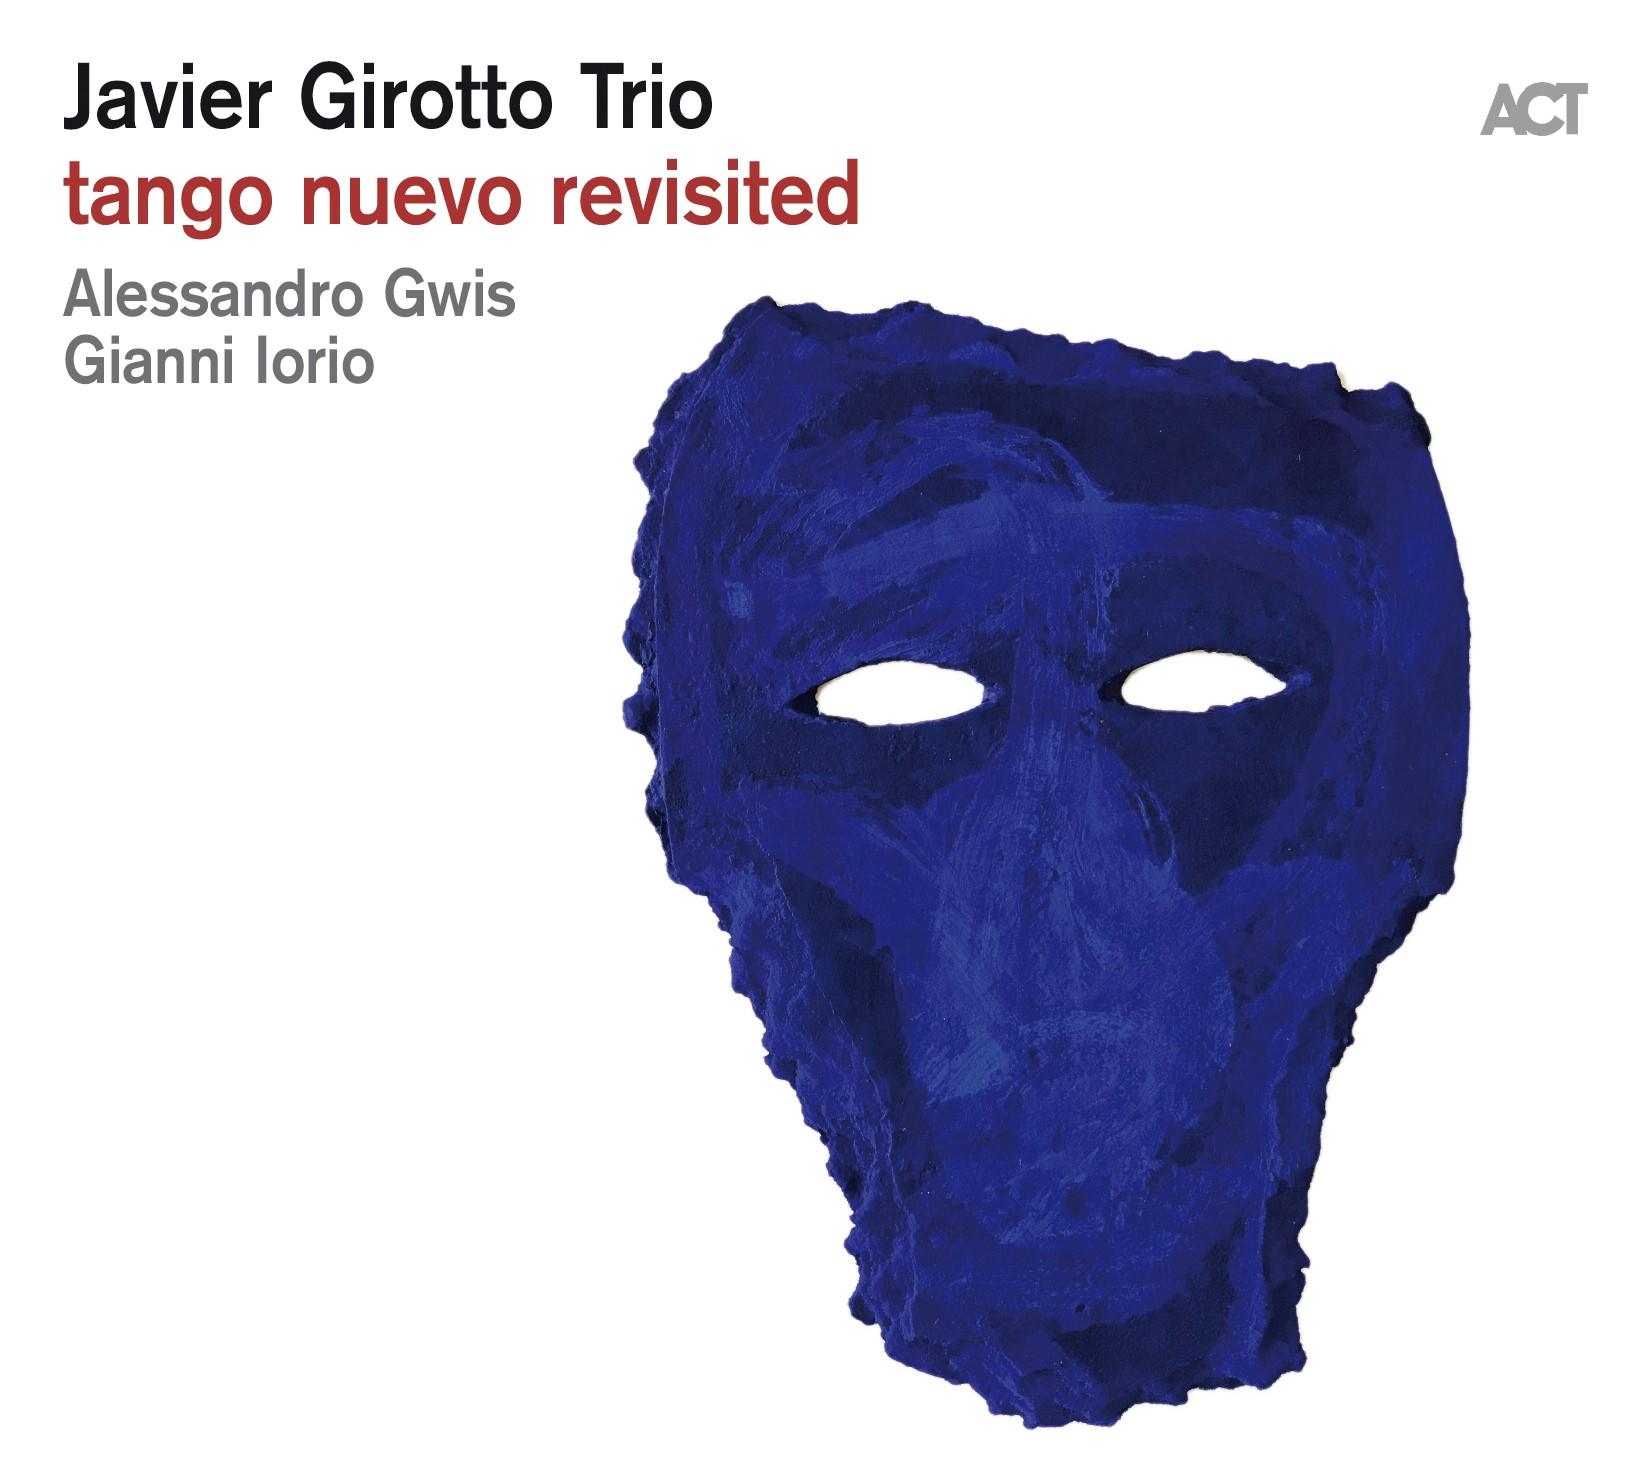 Javier Girotto Trio <br/> Tango Nuevo Revisited <br/> ACT, 2019